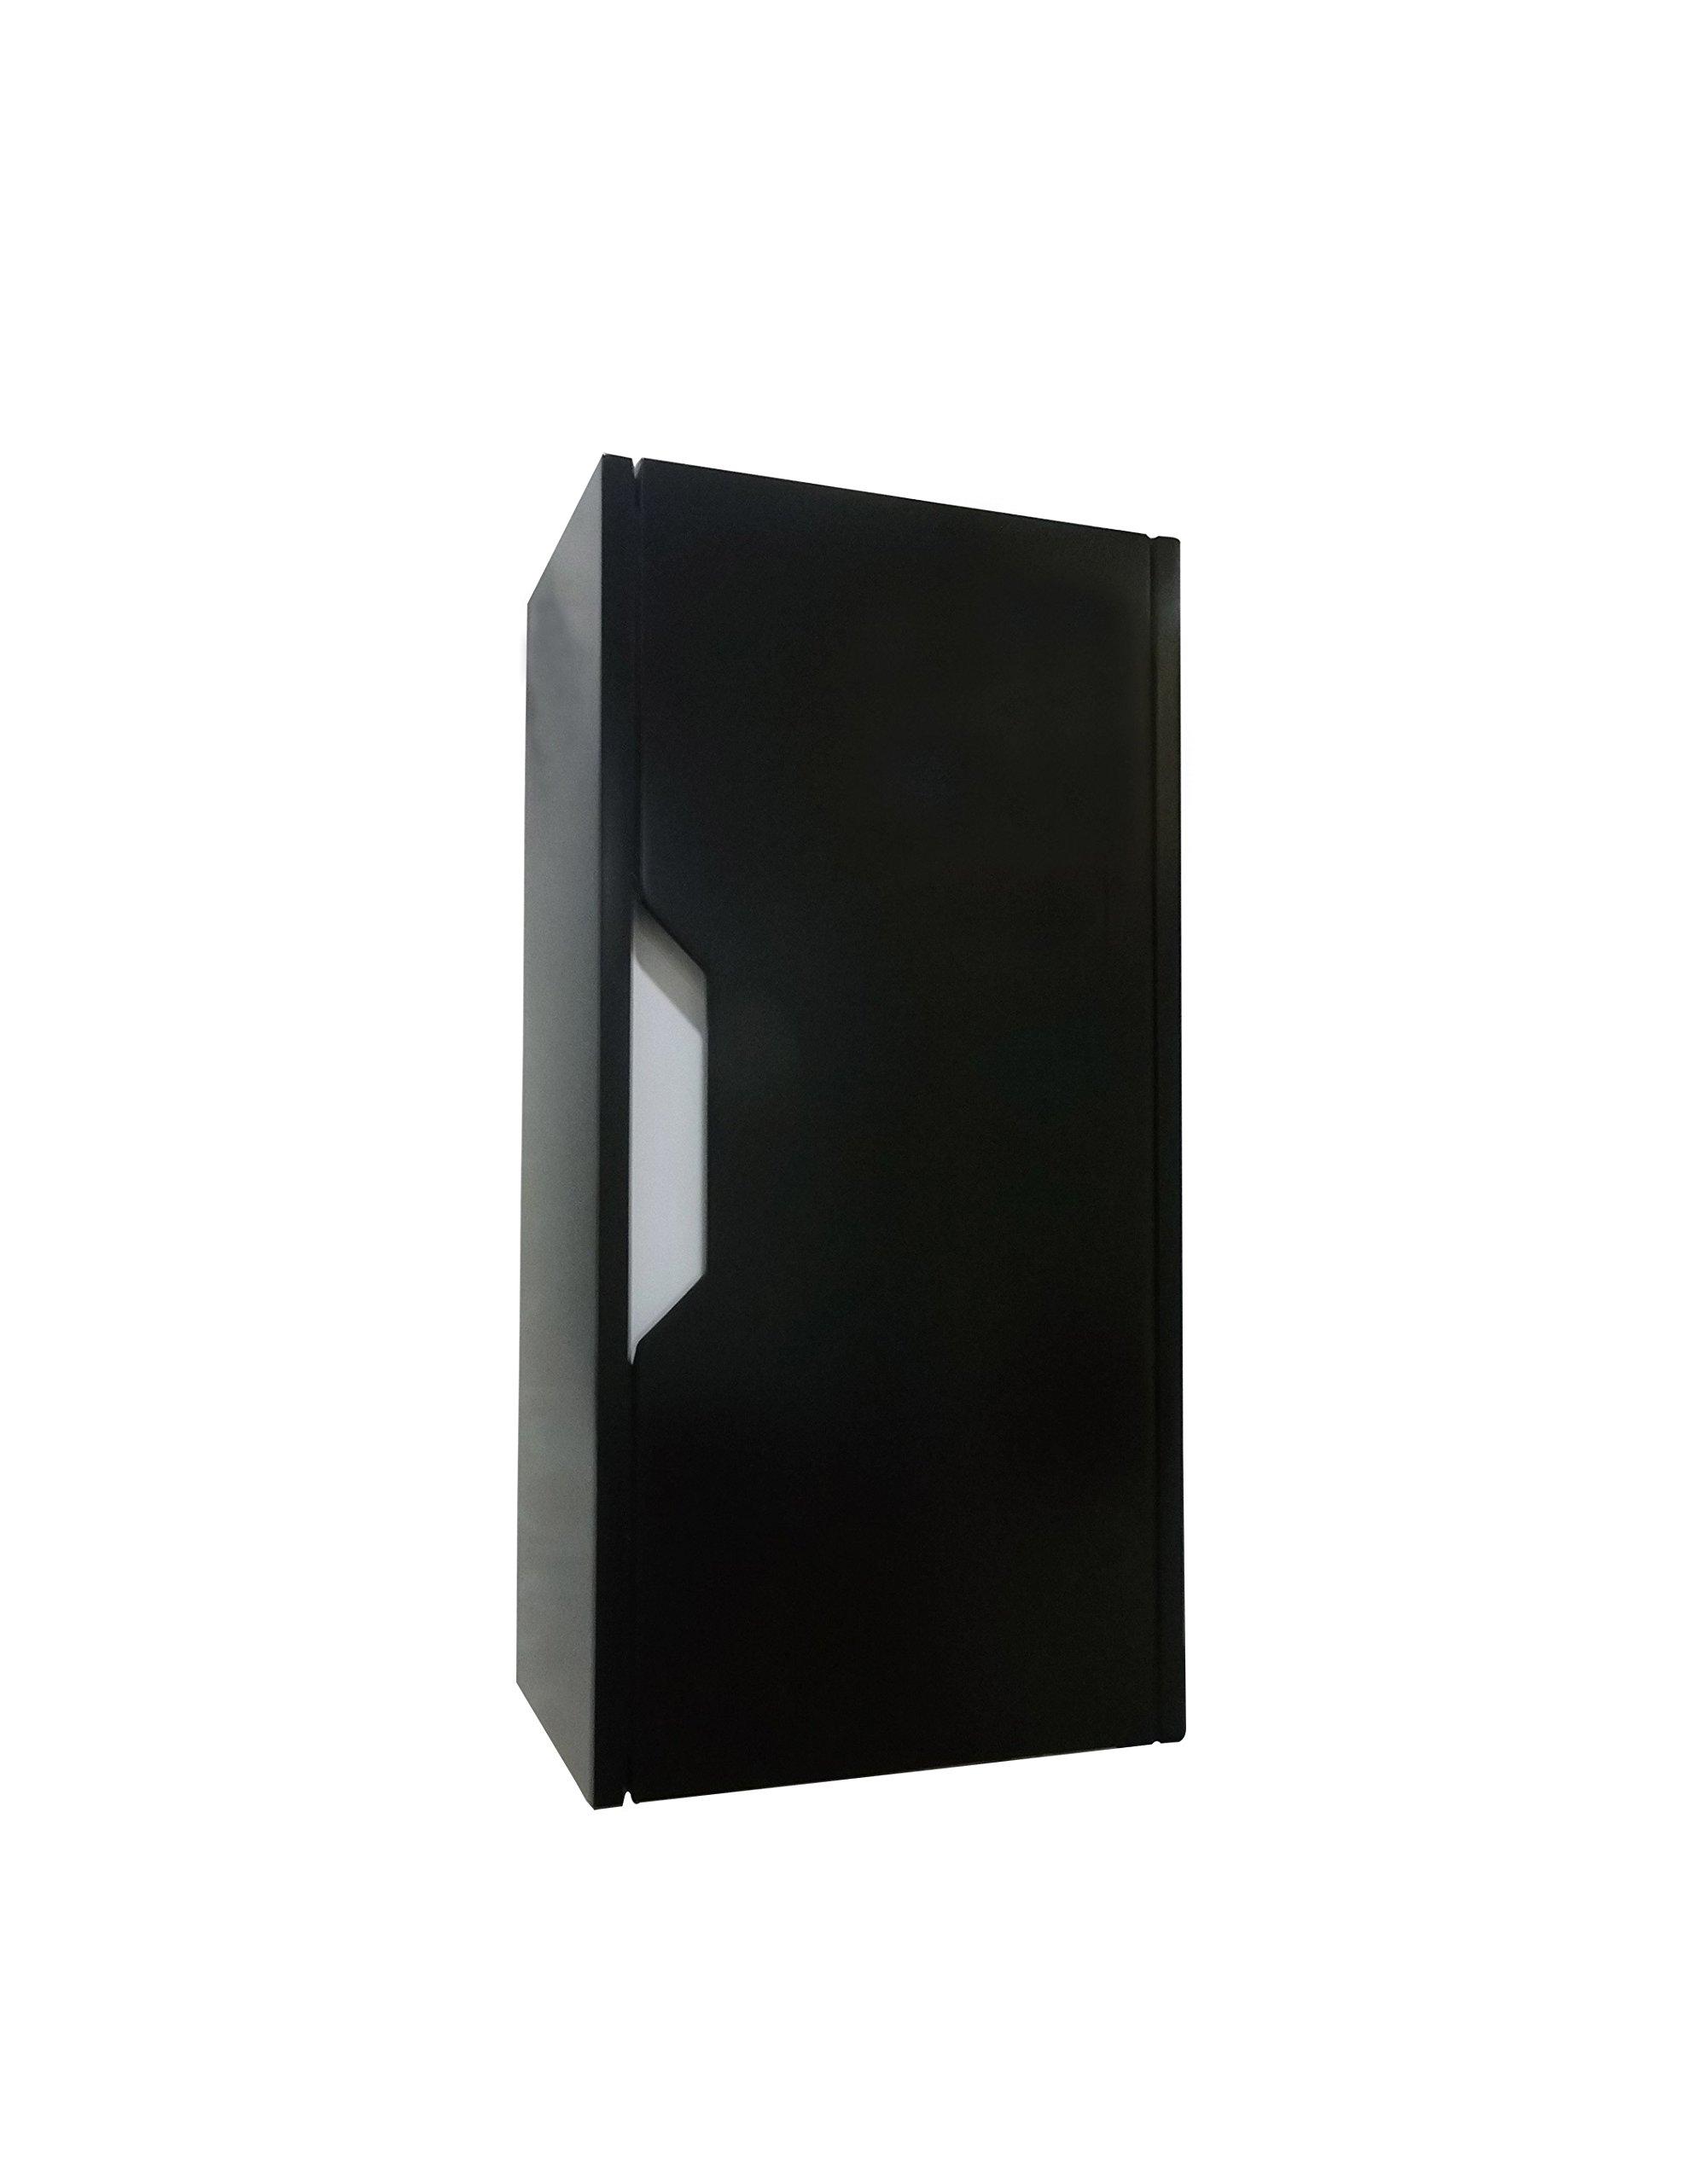 Dawn REMC110723-06 Wall Mounted MDF Side Cabinet with Shelf Inside, Matt Black Finish